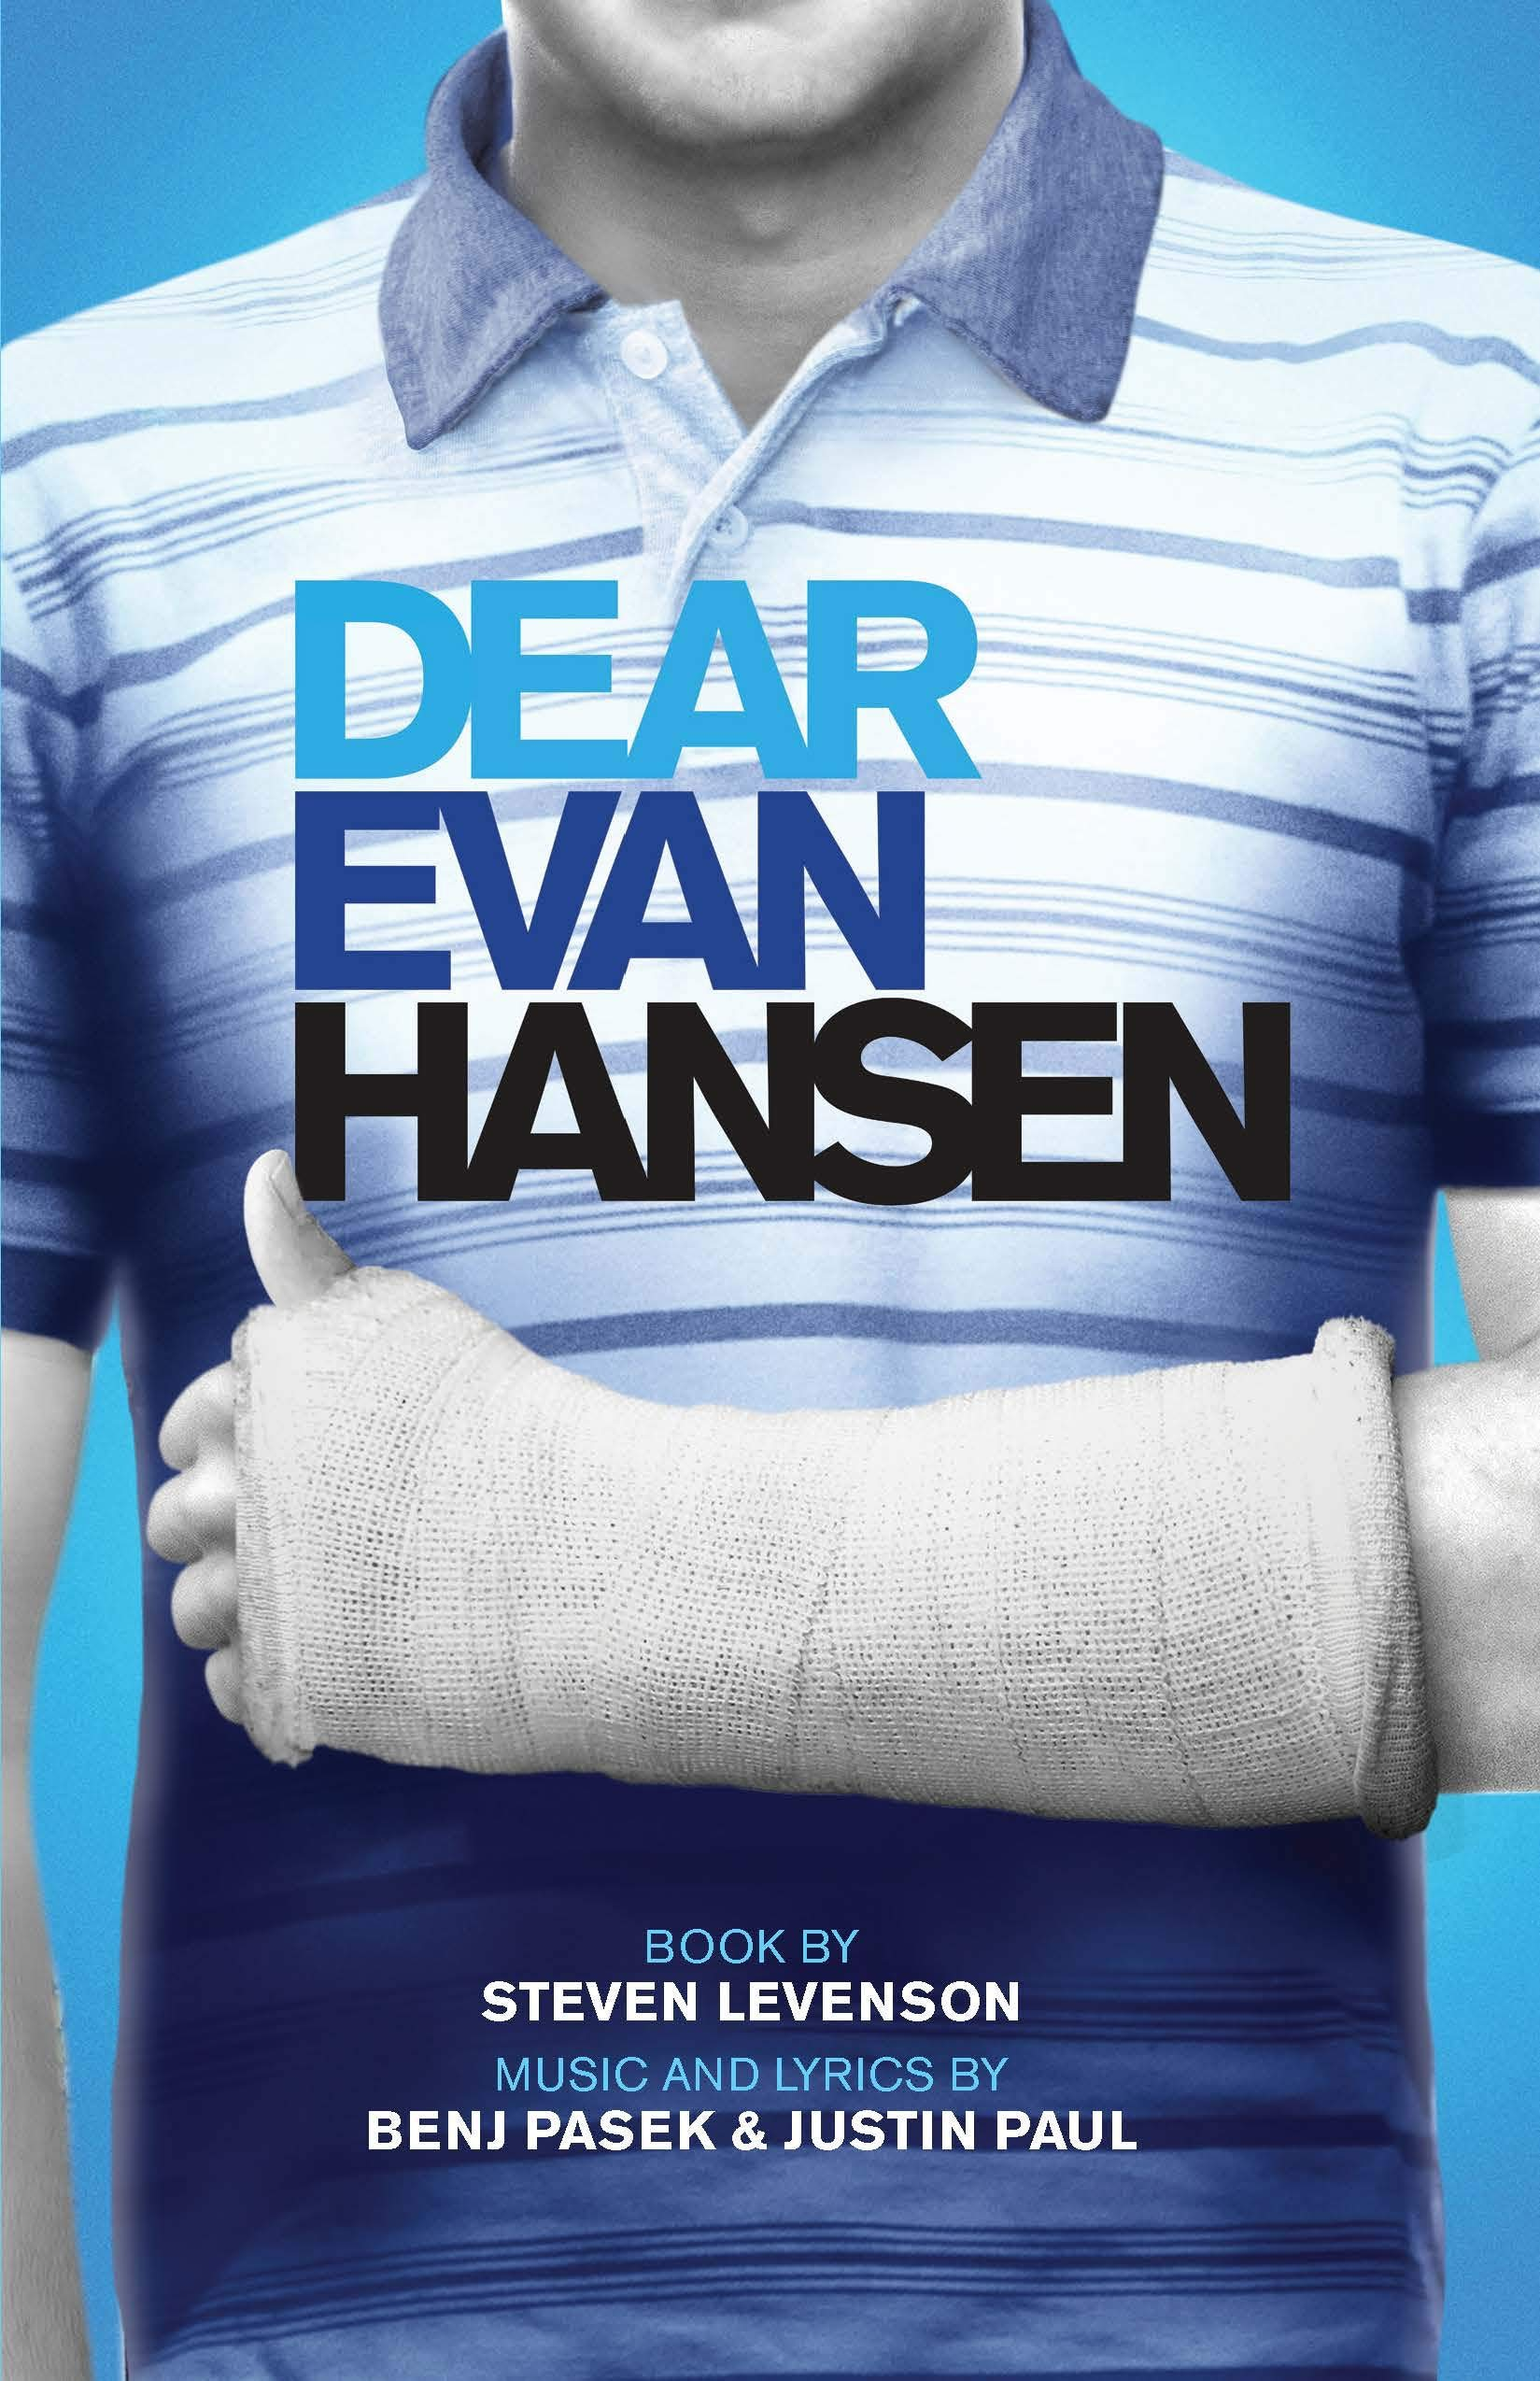 db10d4dac Dear Evan Hansen (TCG Edition)  Steven Levenson